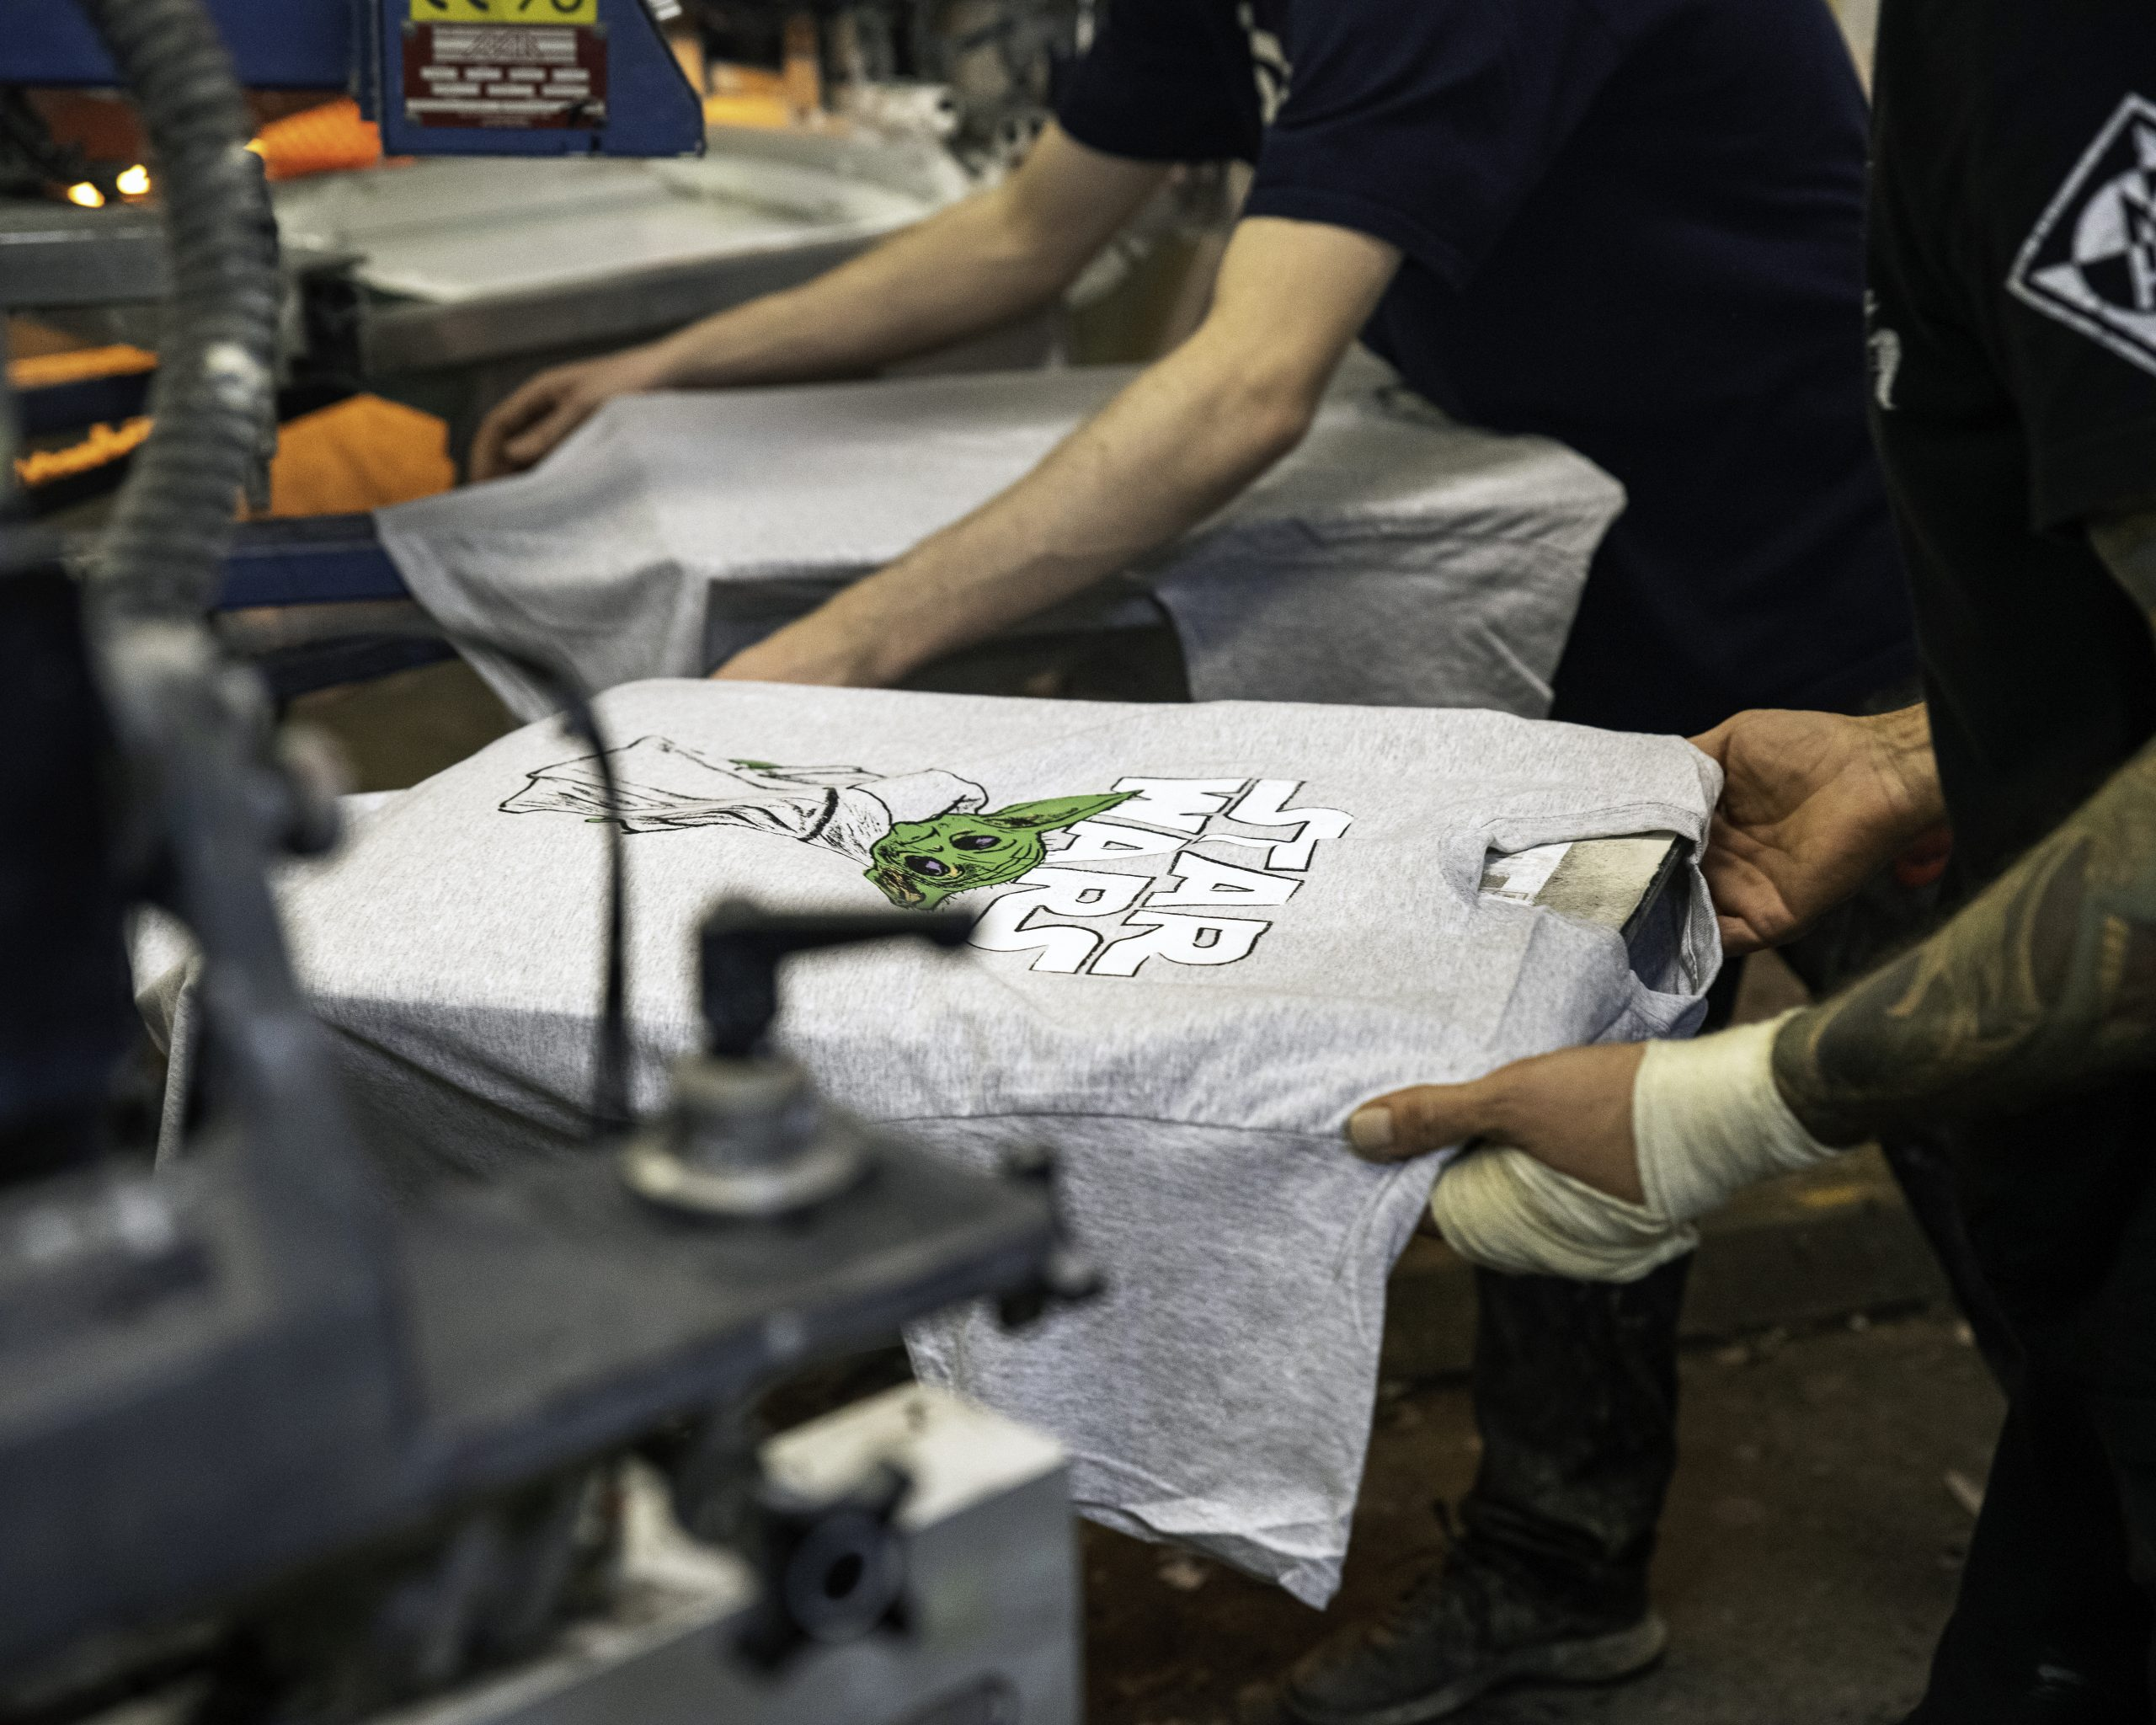 Star Wars T-shirt - T-shirt Printing Companies | T-Shirt Printing